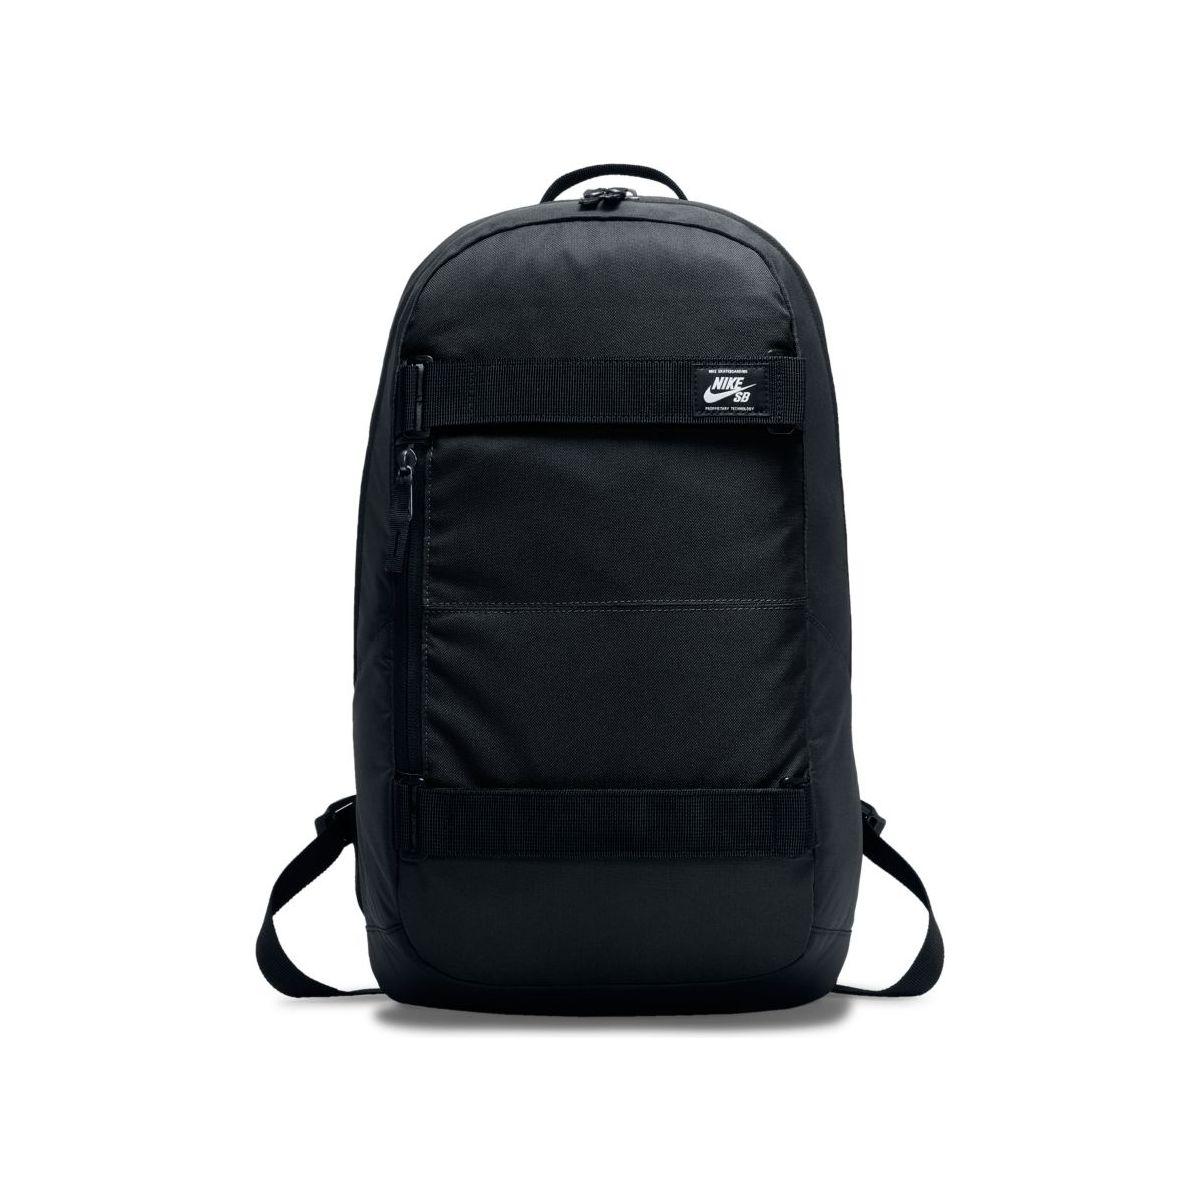 Plecak Nike SB Courthouse Black / Black / White